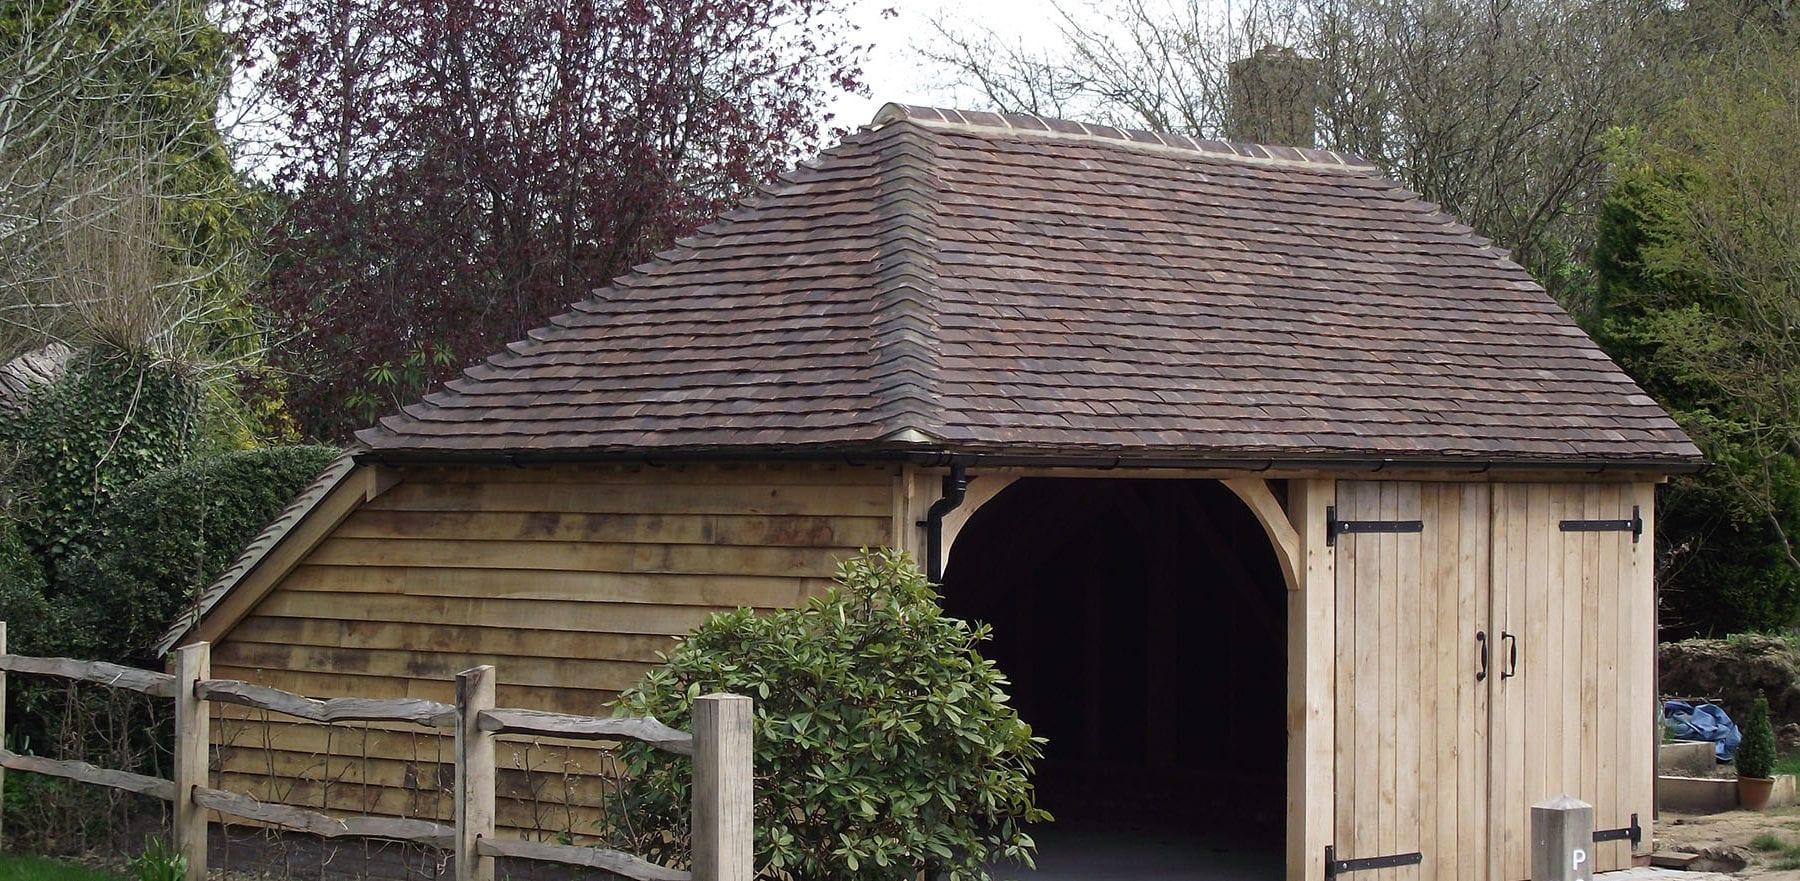 Lifestiles - Handmade Restoration Clay Roof Tiles - Cart Lodge, England